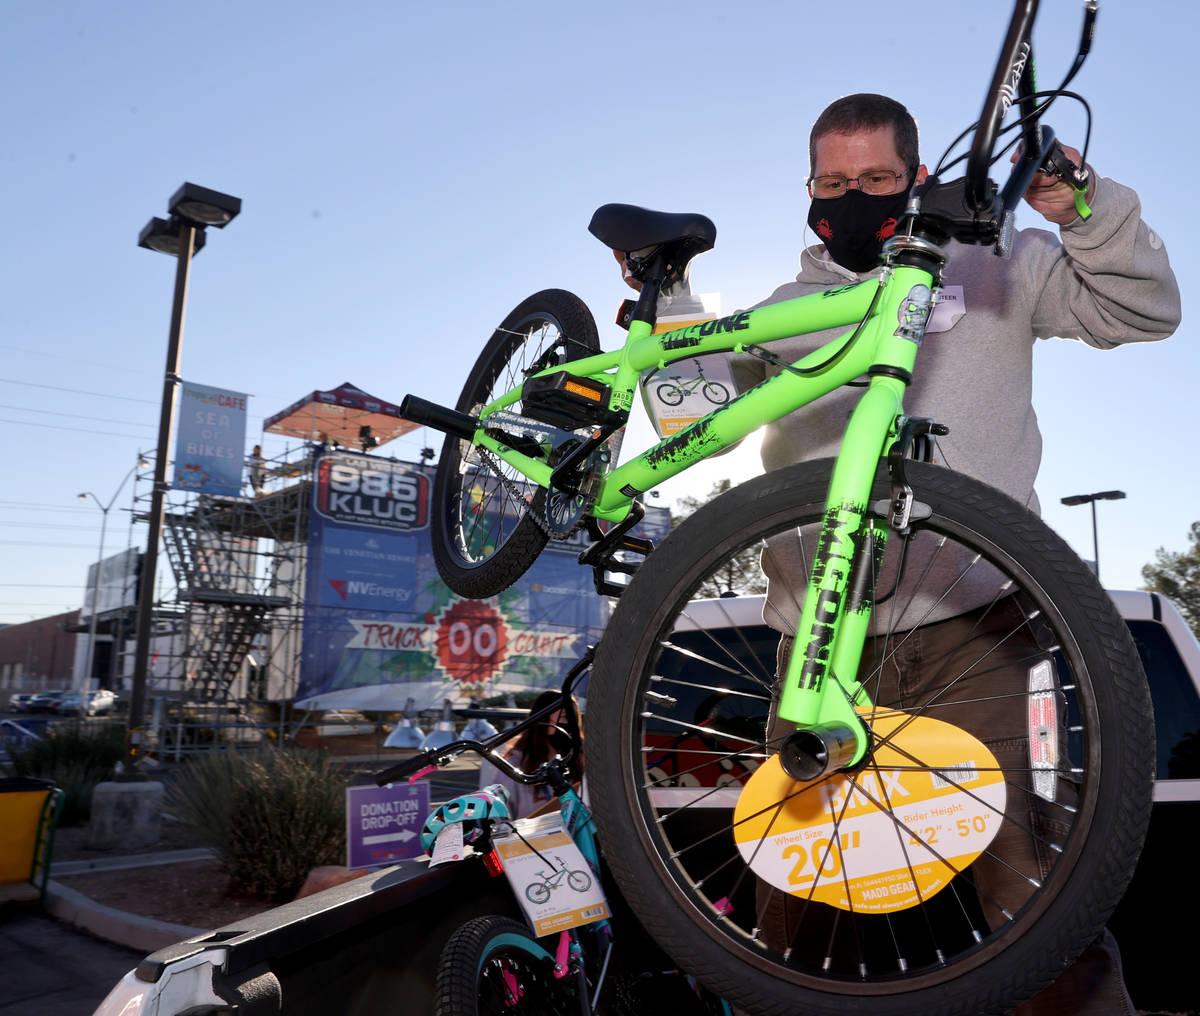 Volunteer Matt Rose loads a donated bike during the Chet Buchanan KLUC-FM toy drive in the NV E ...